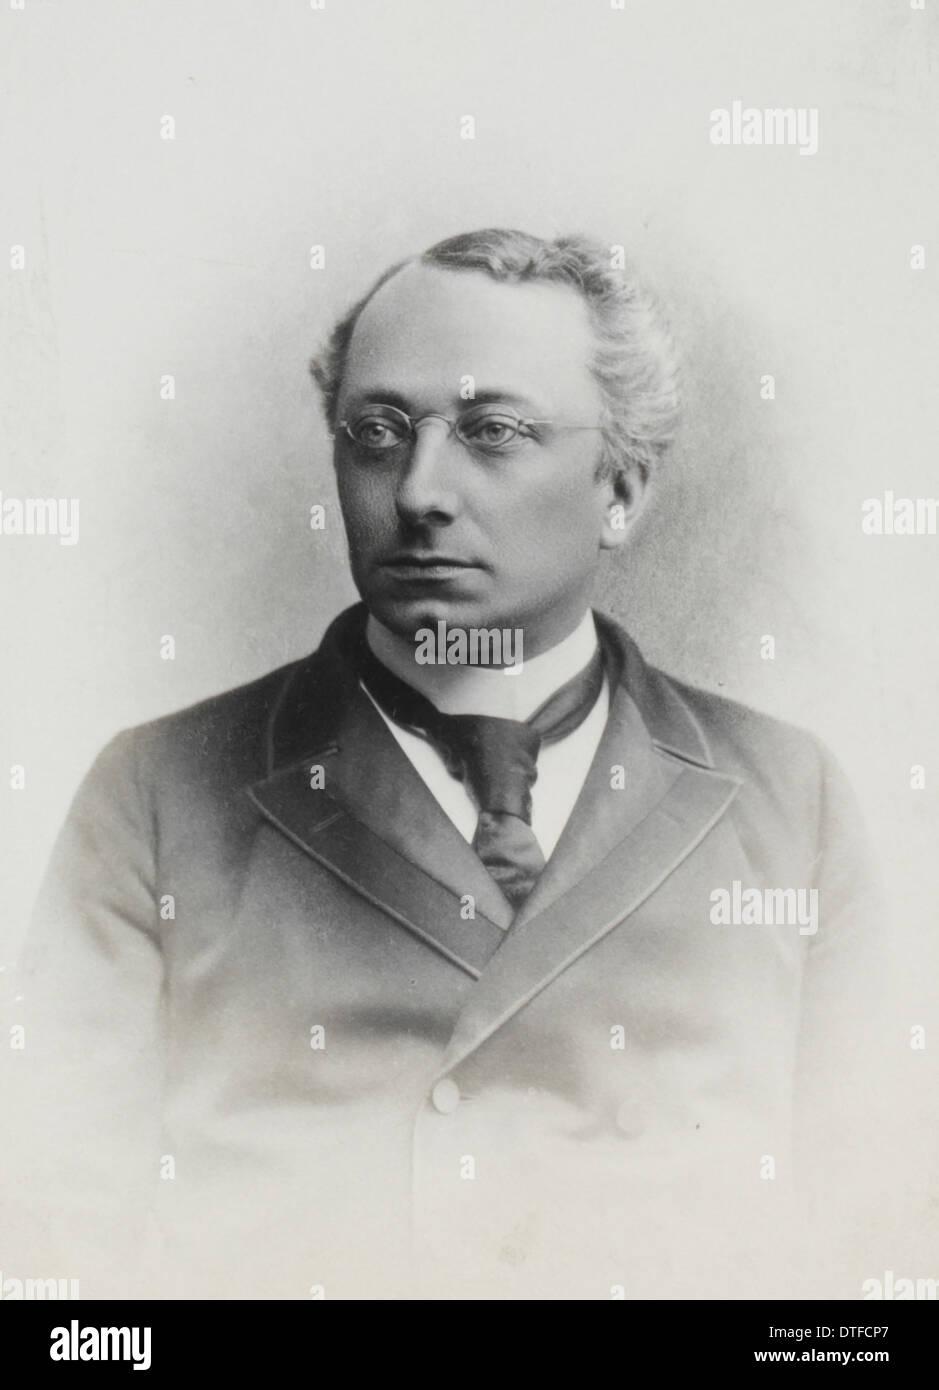 Ambrosius Arnold Willem Hubrecht (1853-1915) - Stock Image